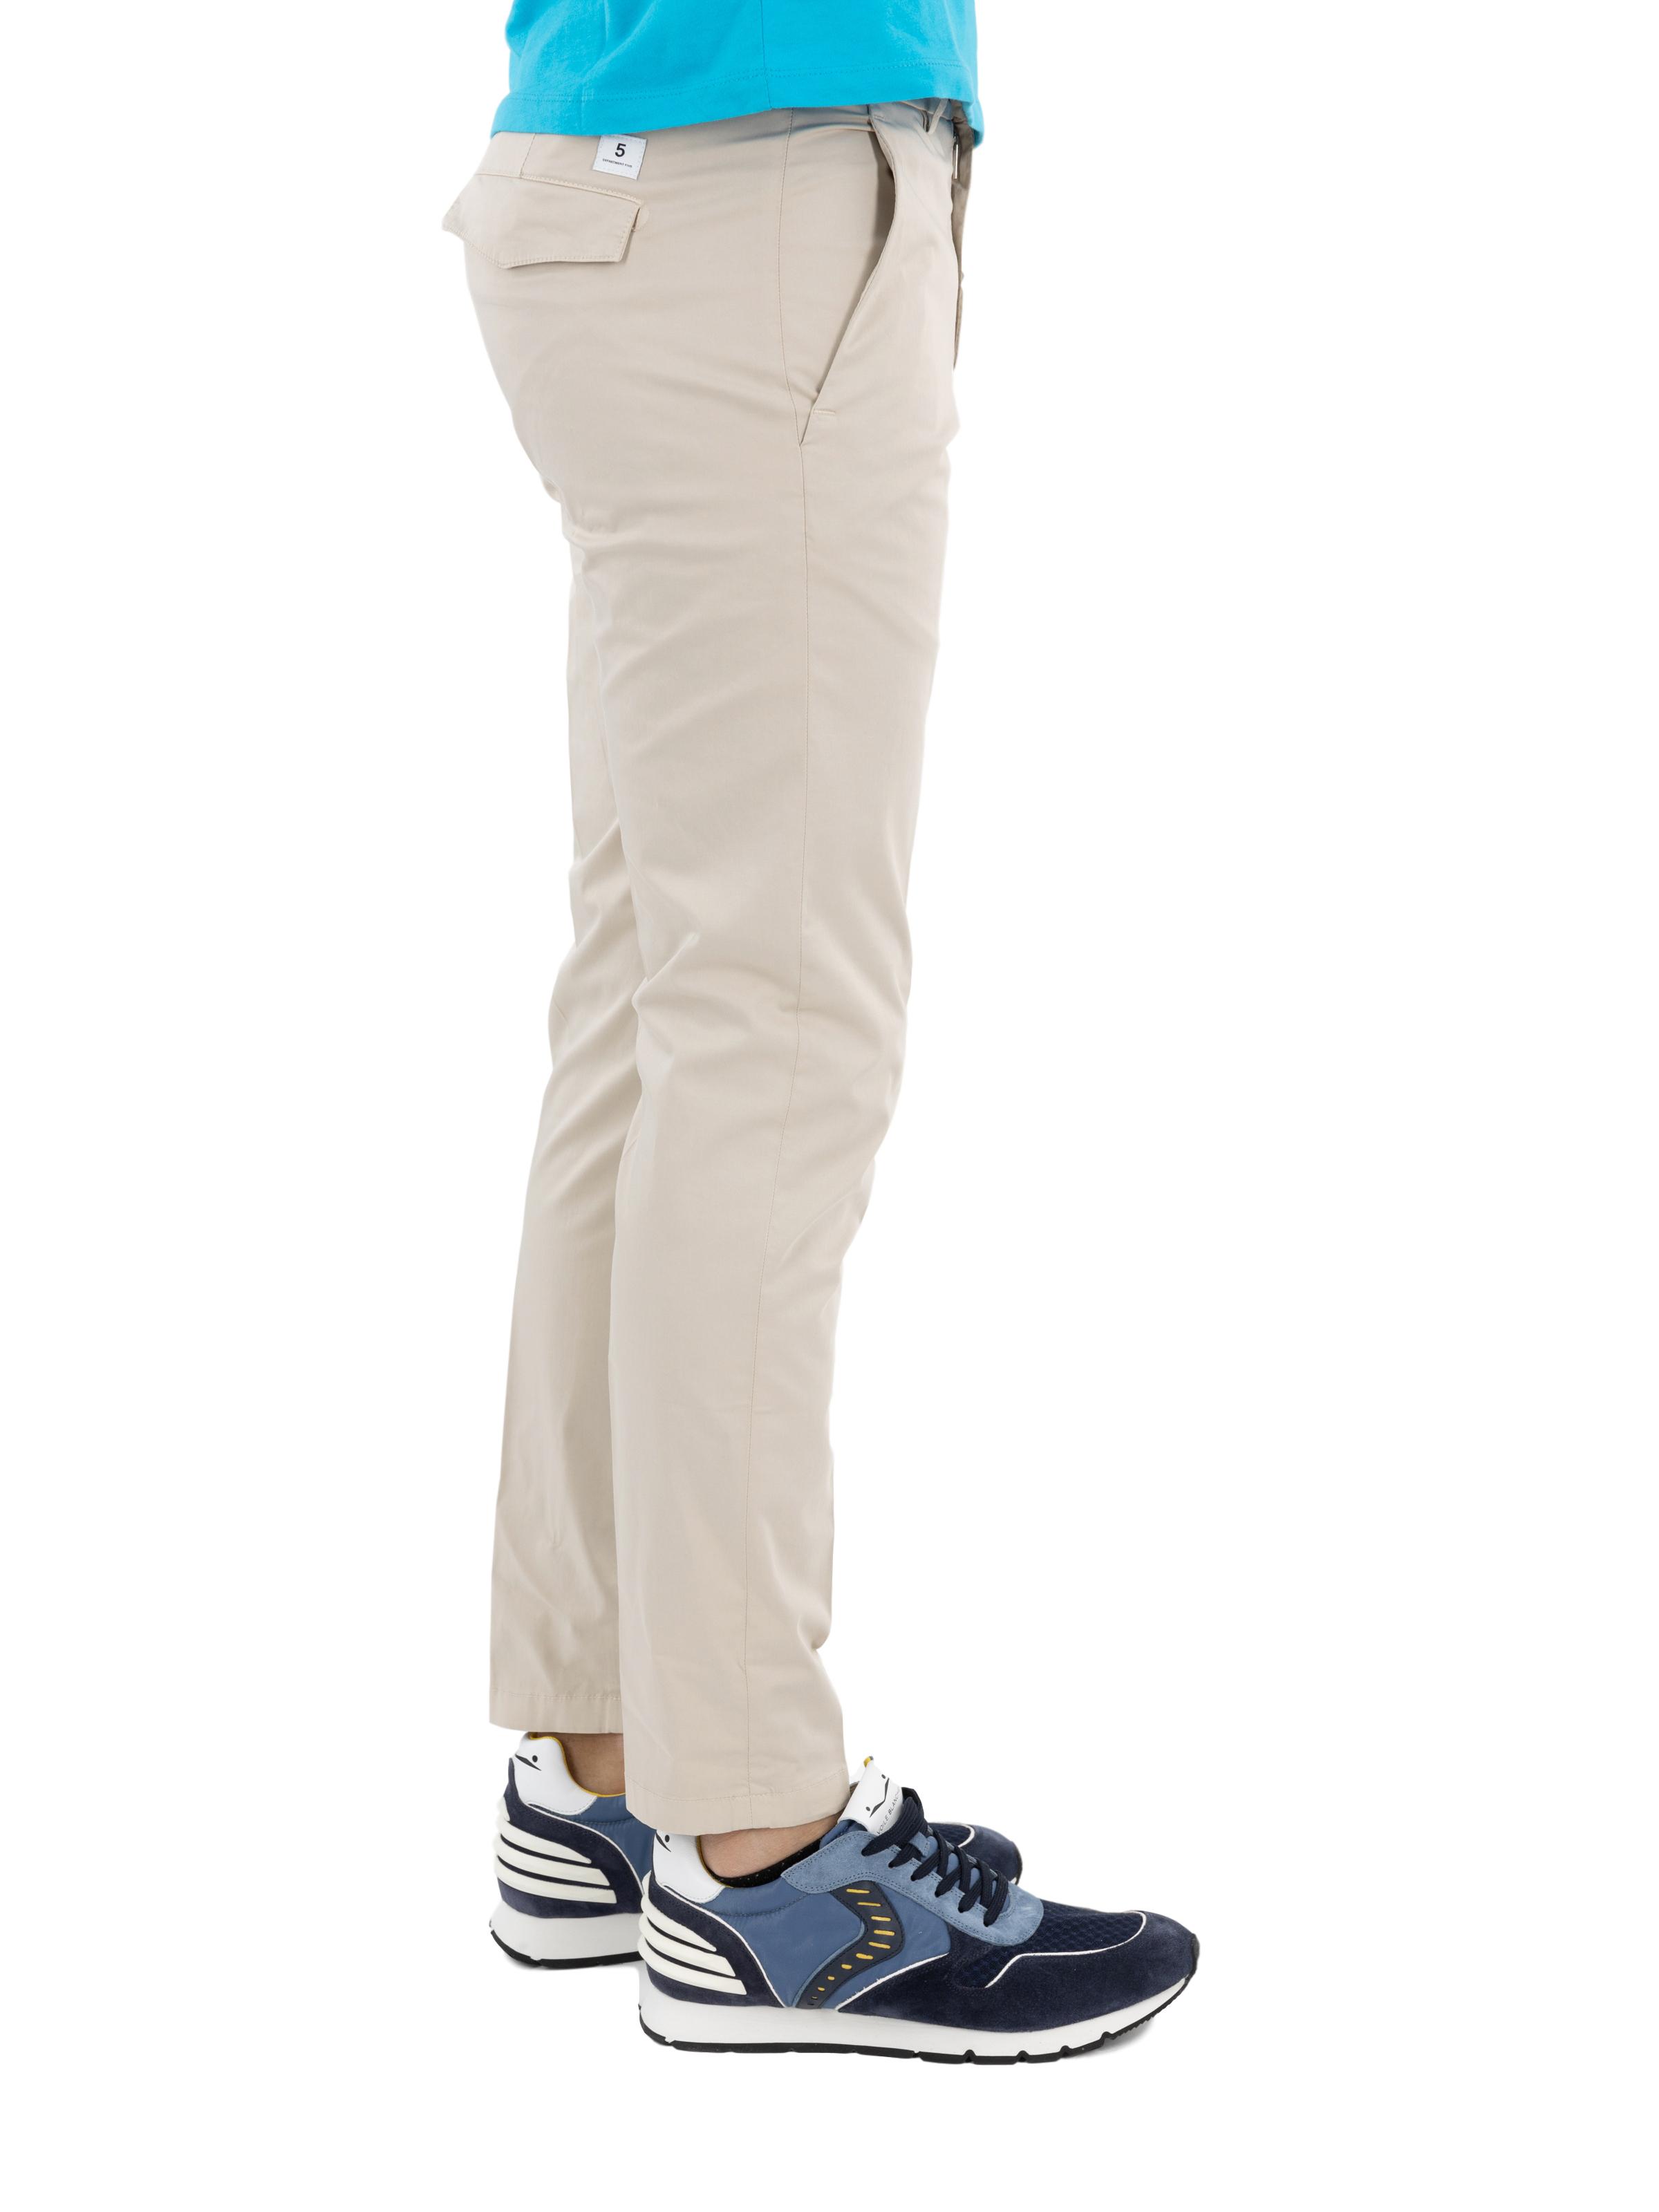 Department Five Pantalone Prince U20P05 T2002